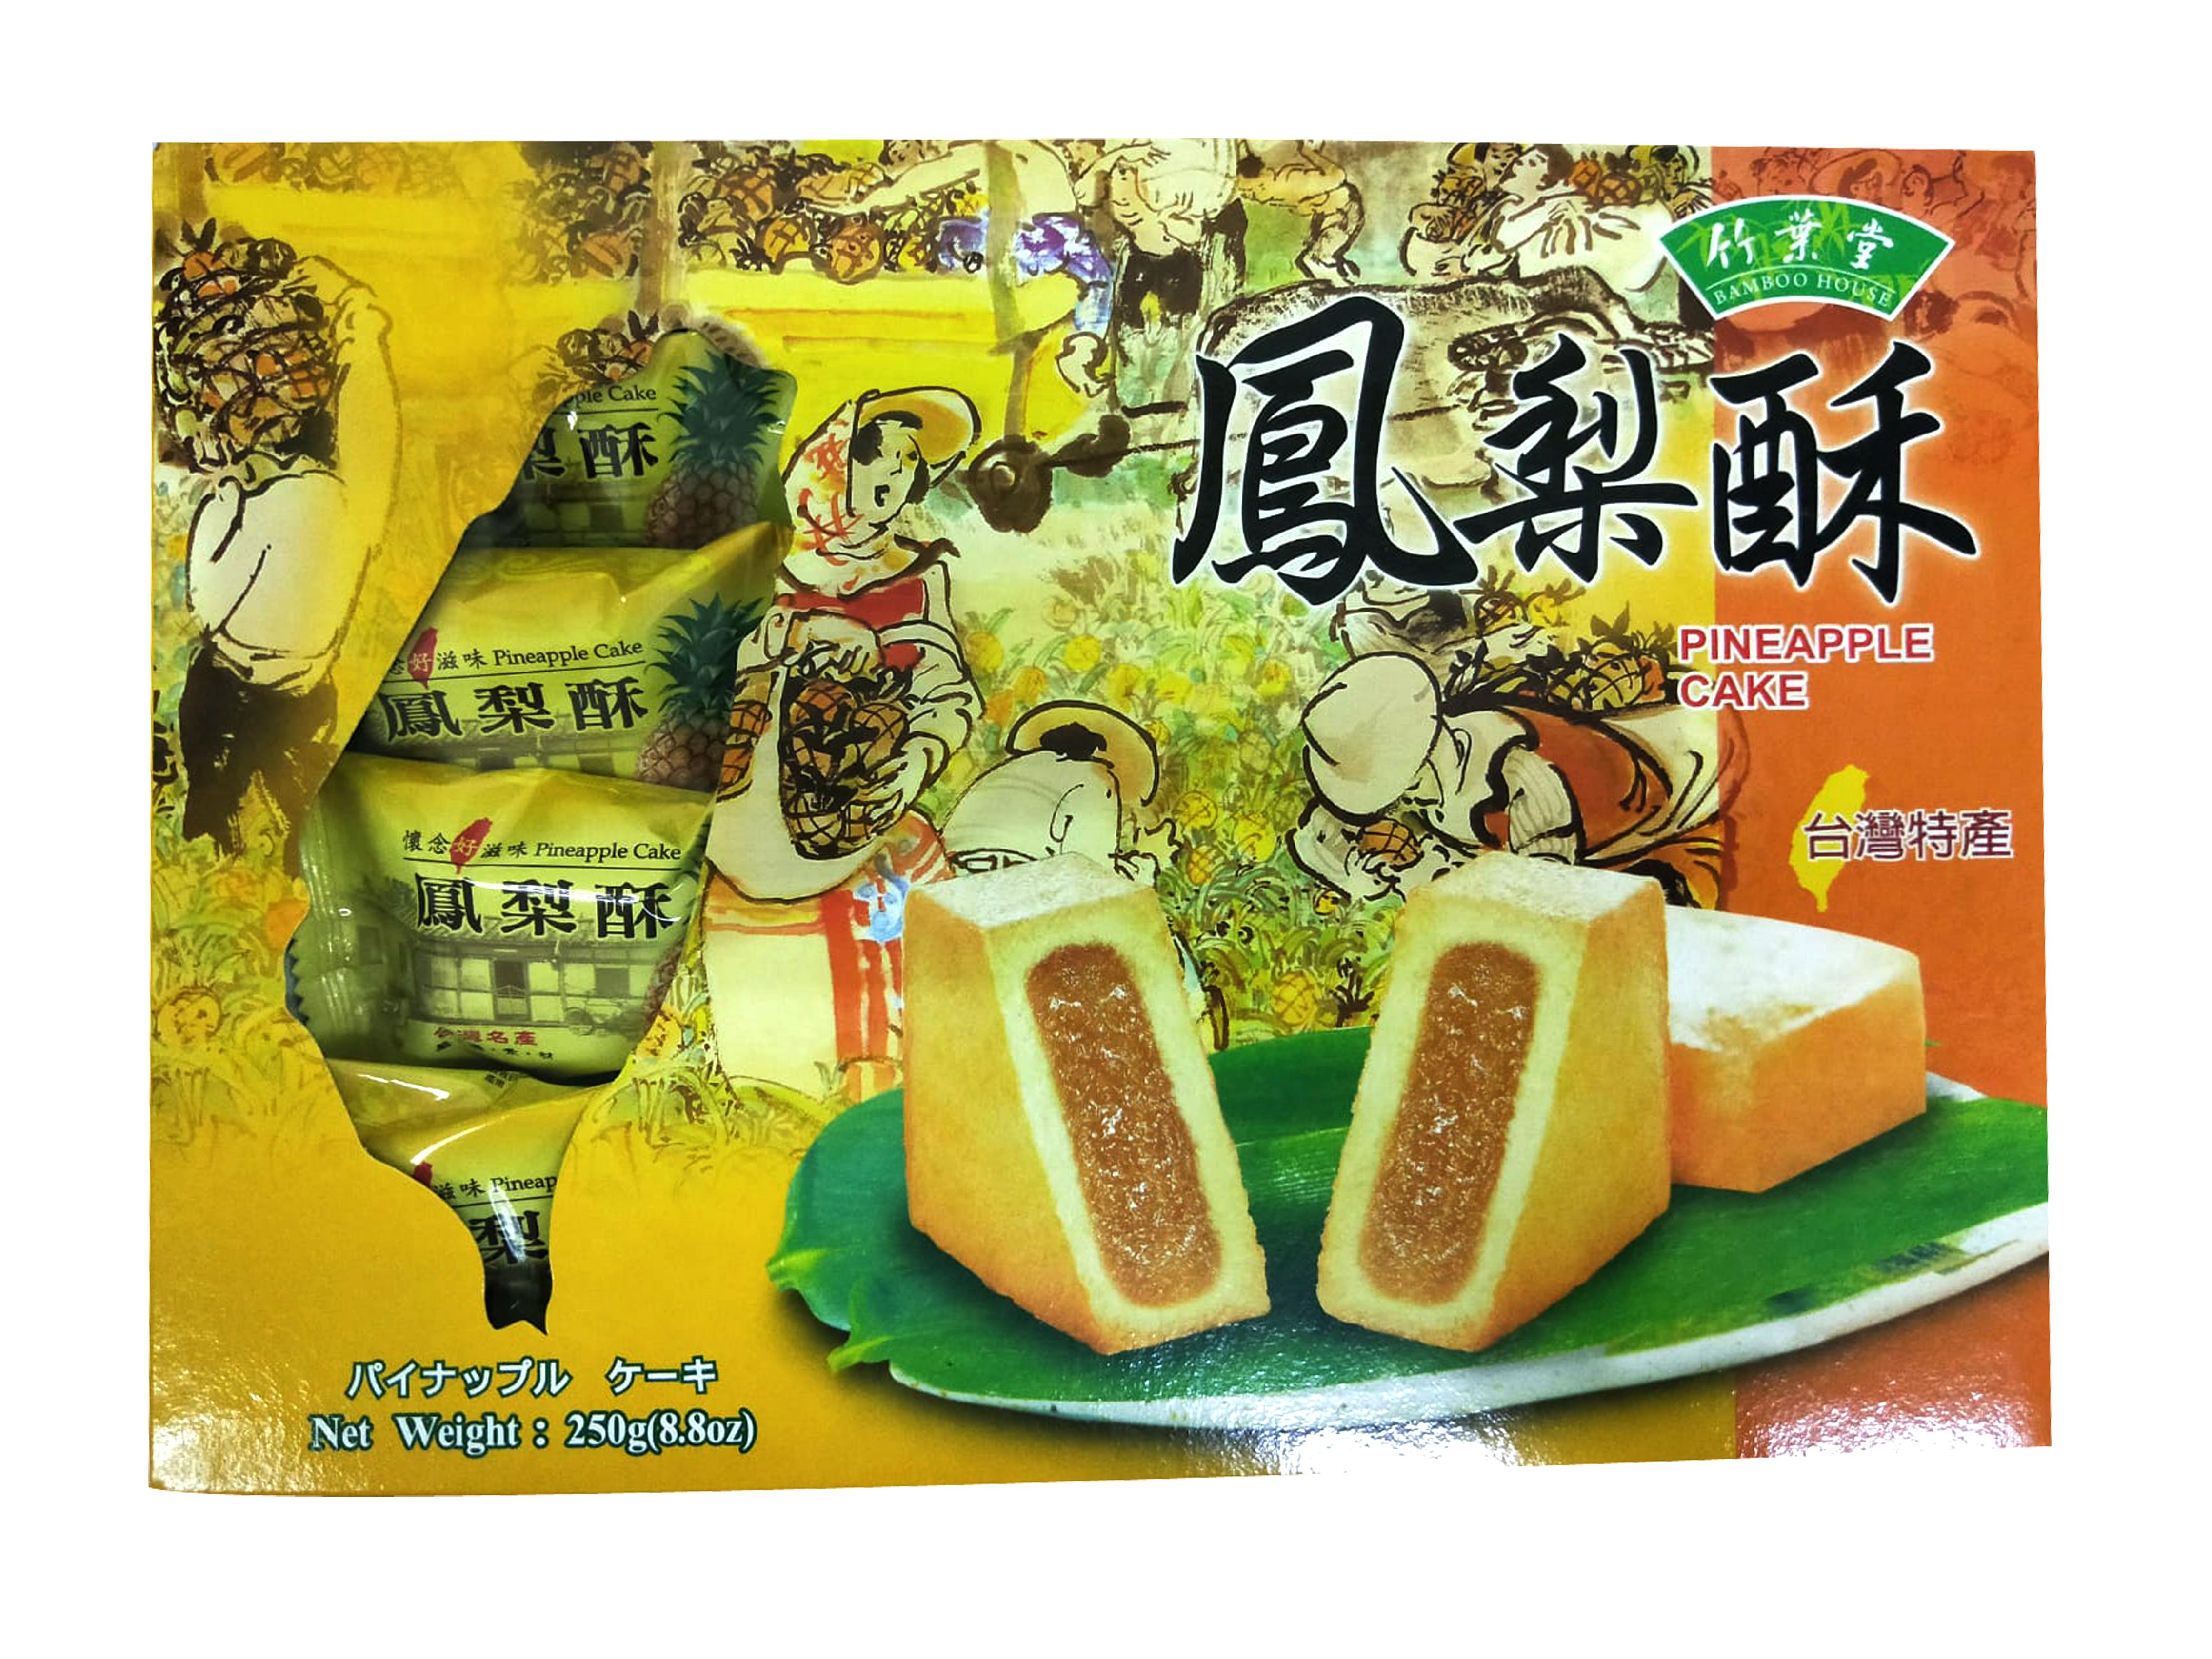 Image Pineapple Cake 竹叶堂-凤梨酥 250grams